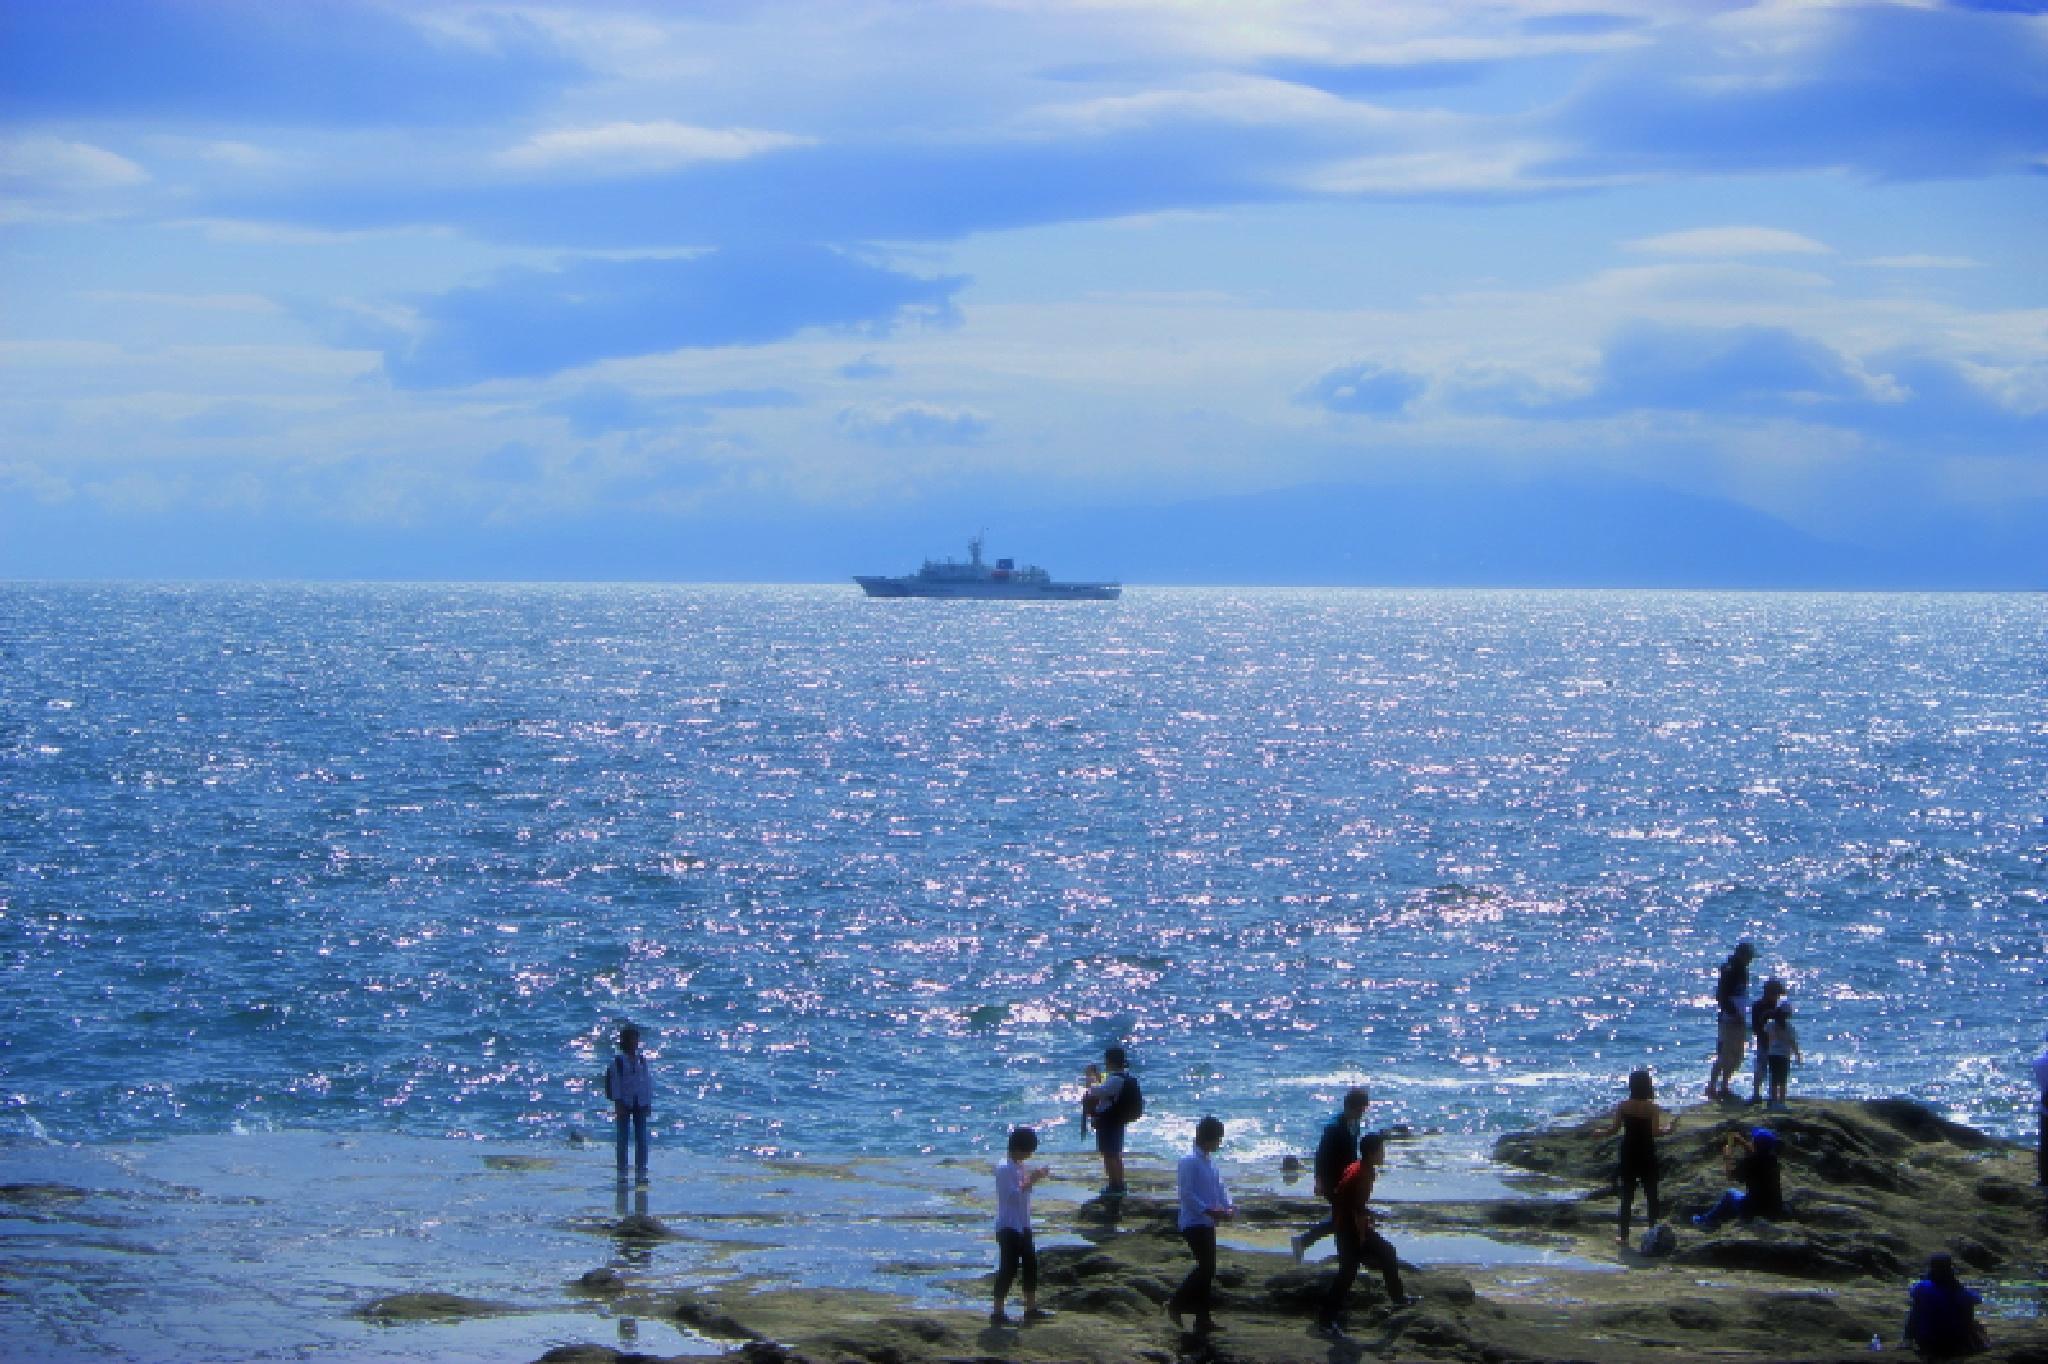 The ship and the sea by HAJIME KAMEZAKI